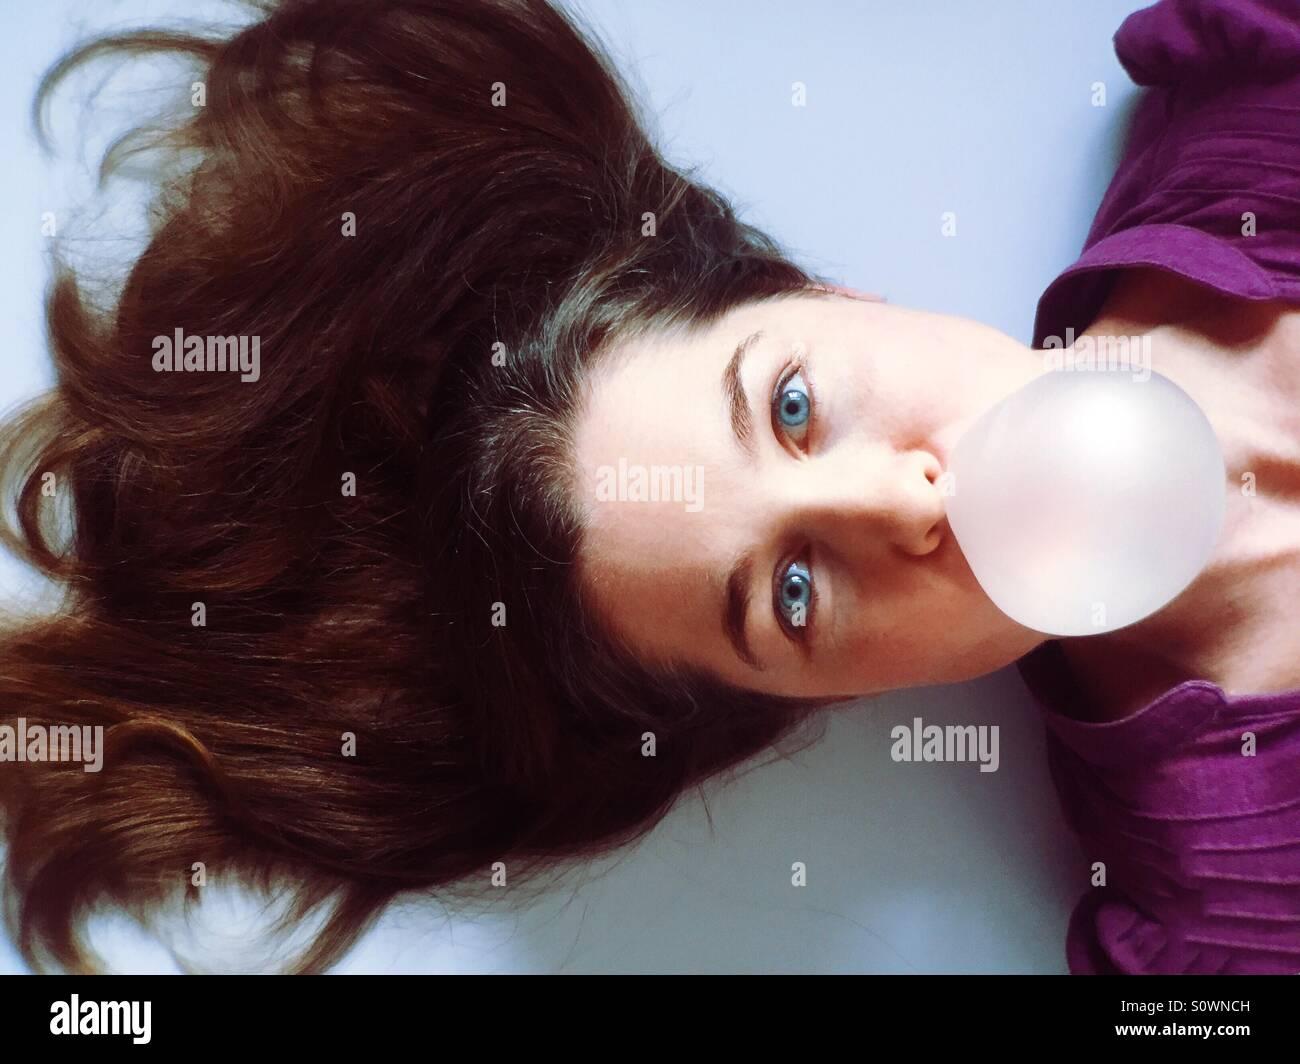 Frau bläst eine Kaugummi-Blase Stockbild